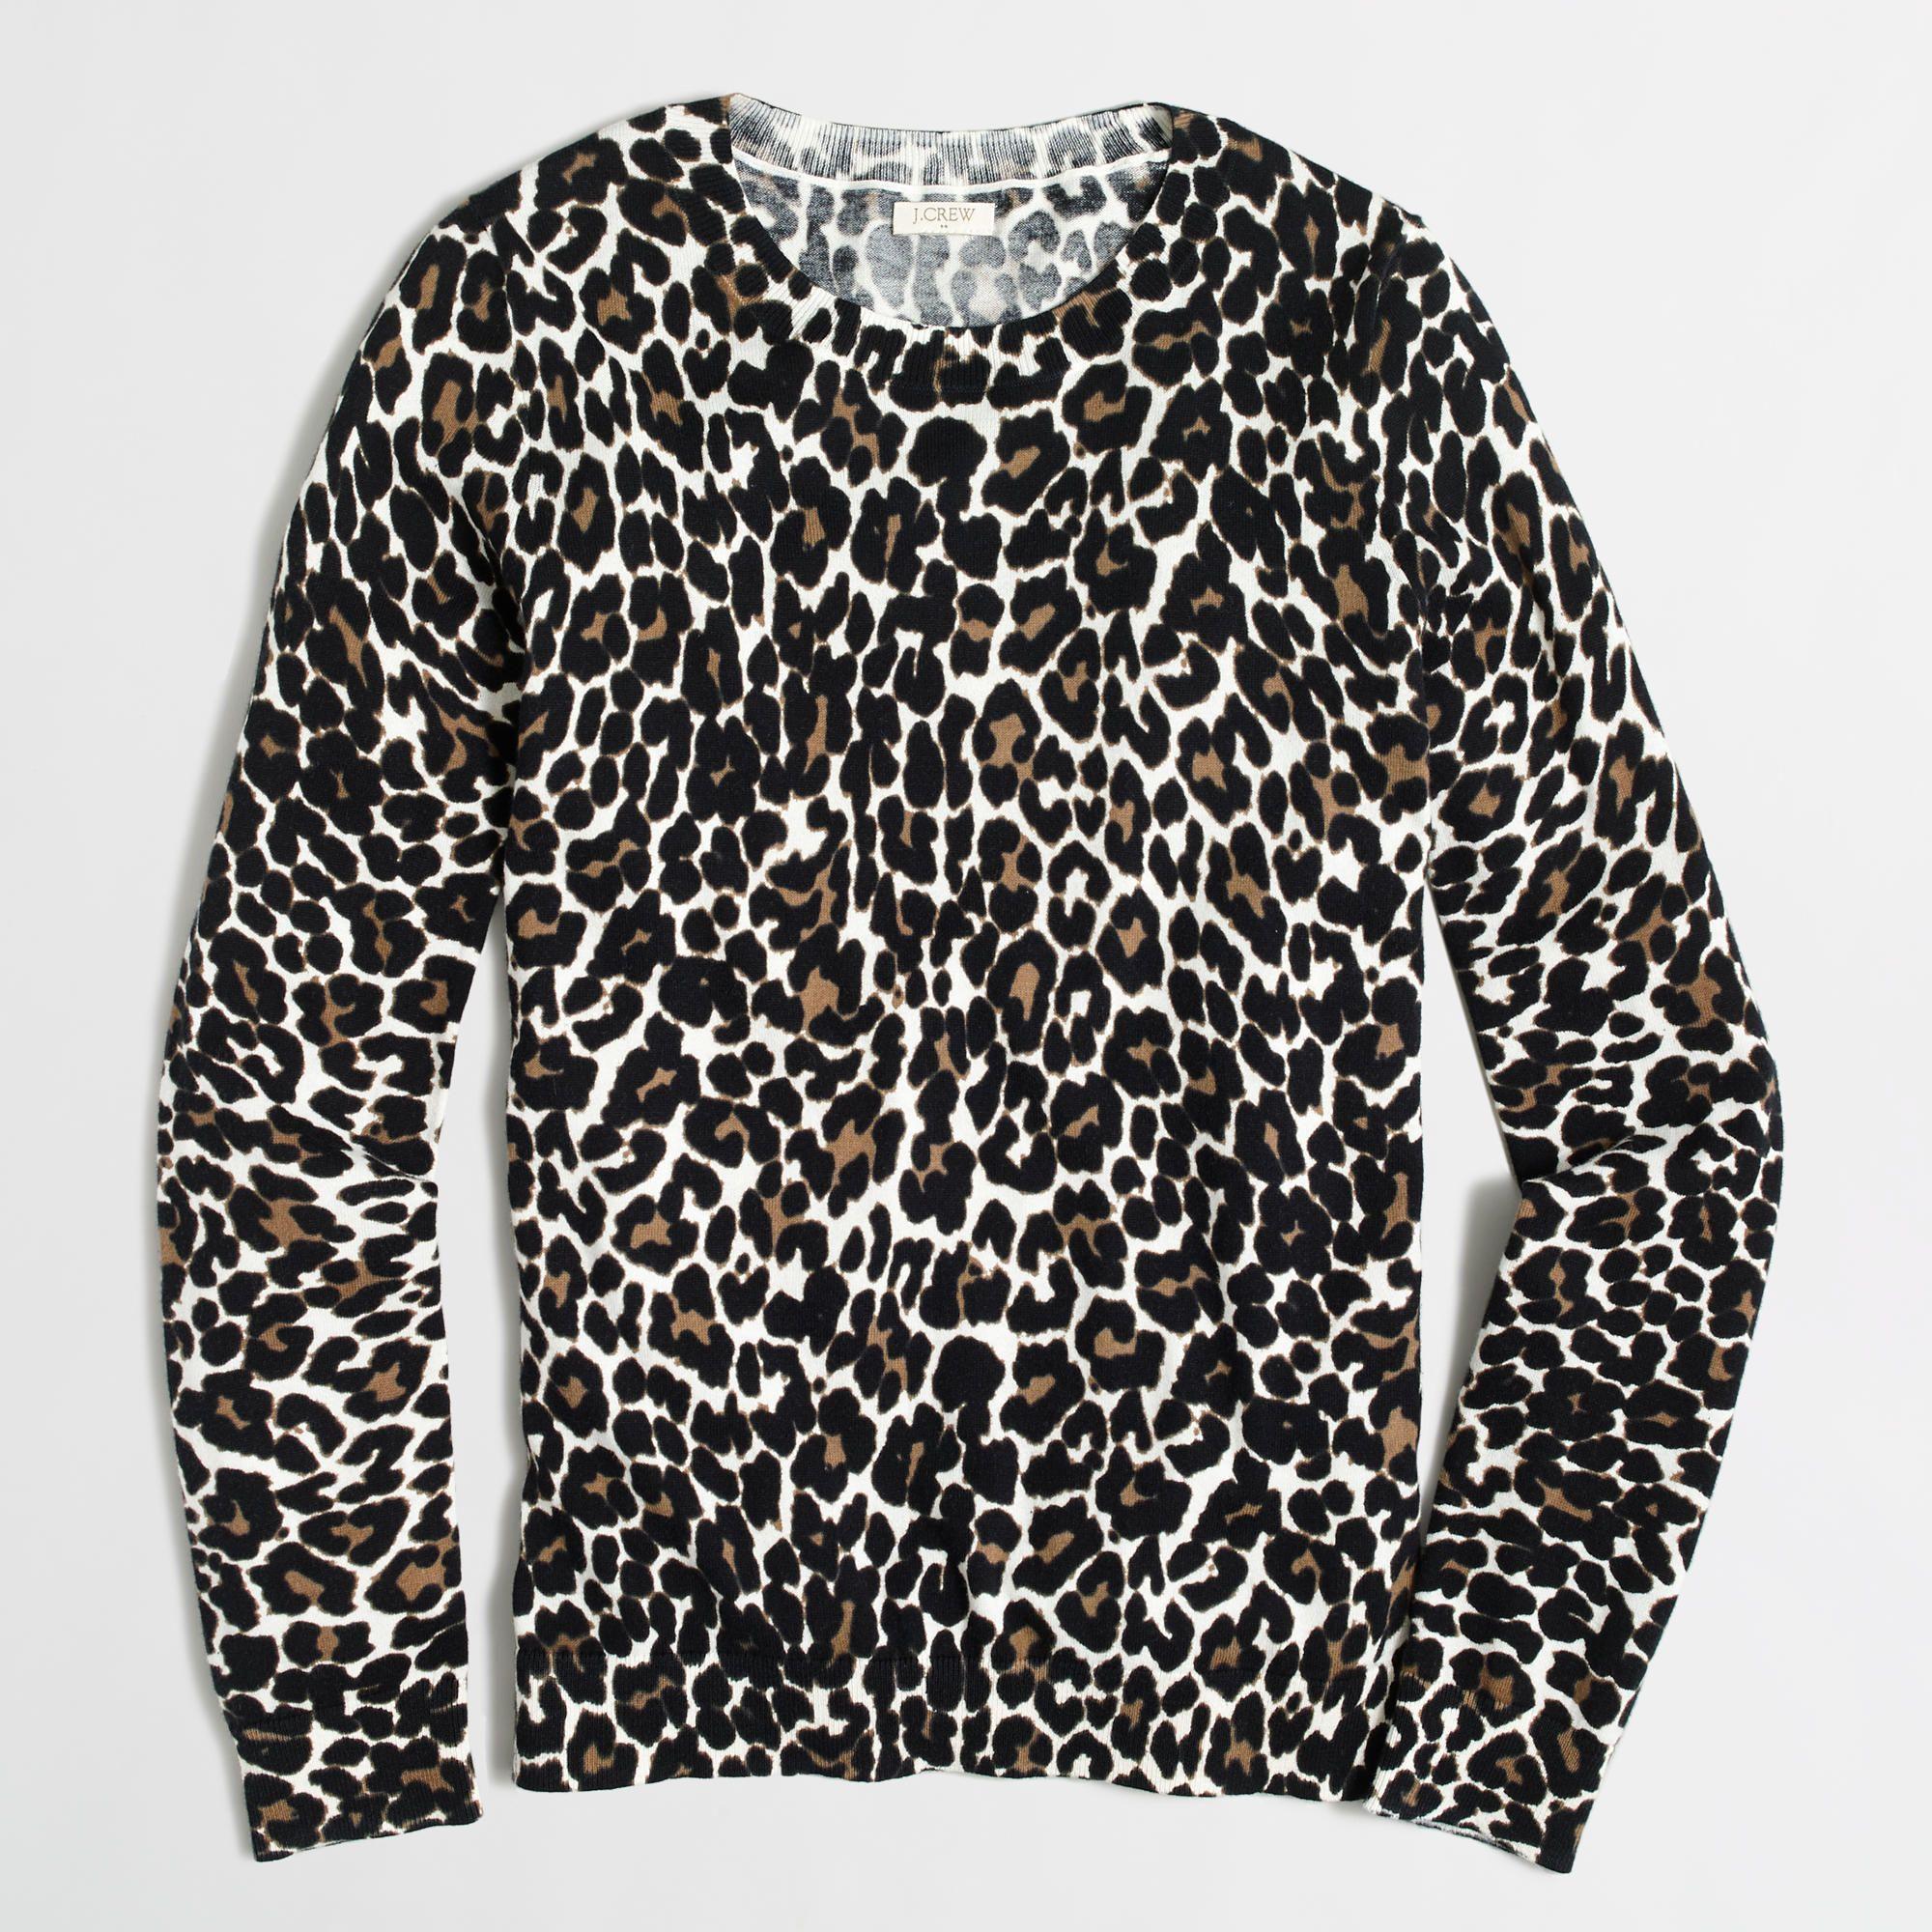 https://factory.jcrew.com/p/womens-clothing/sweaters ...